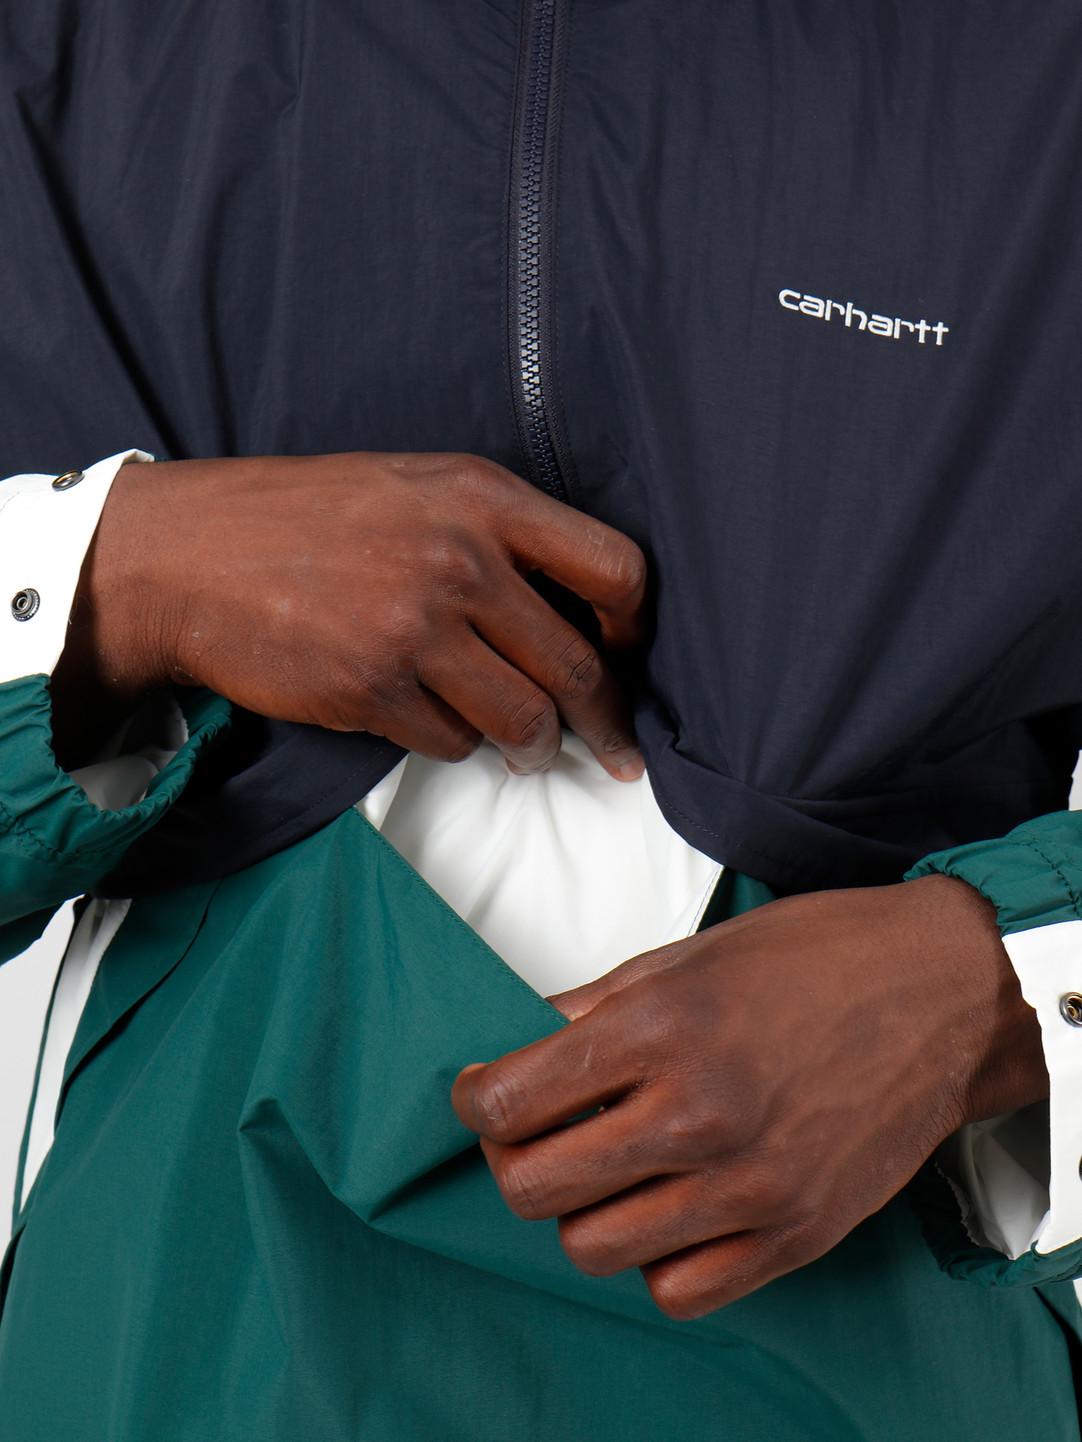 Carhartt WIP Carhartt WIP Barnes Pullover Dark Navy Dark Fir Wax I027192